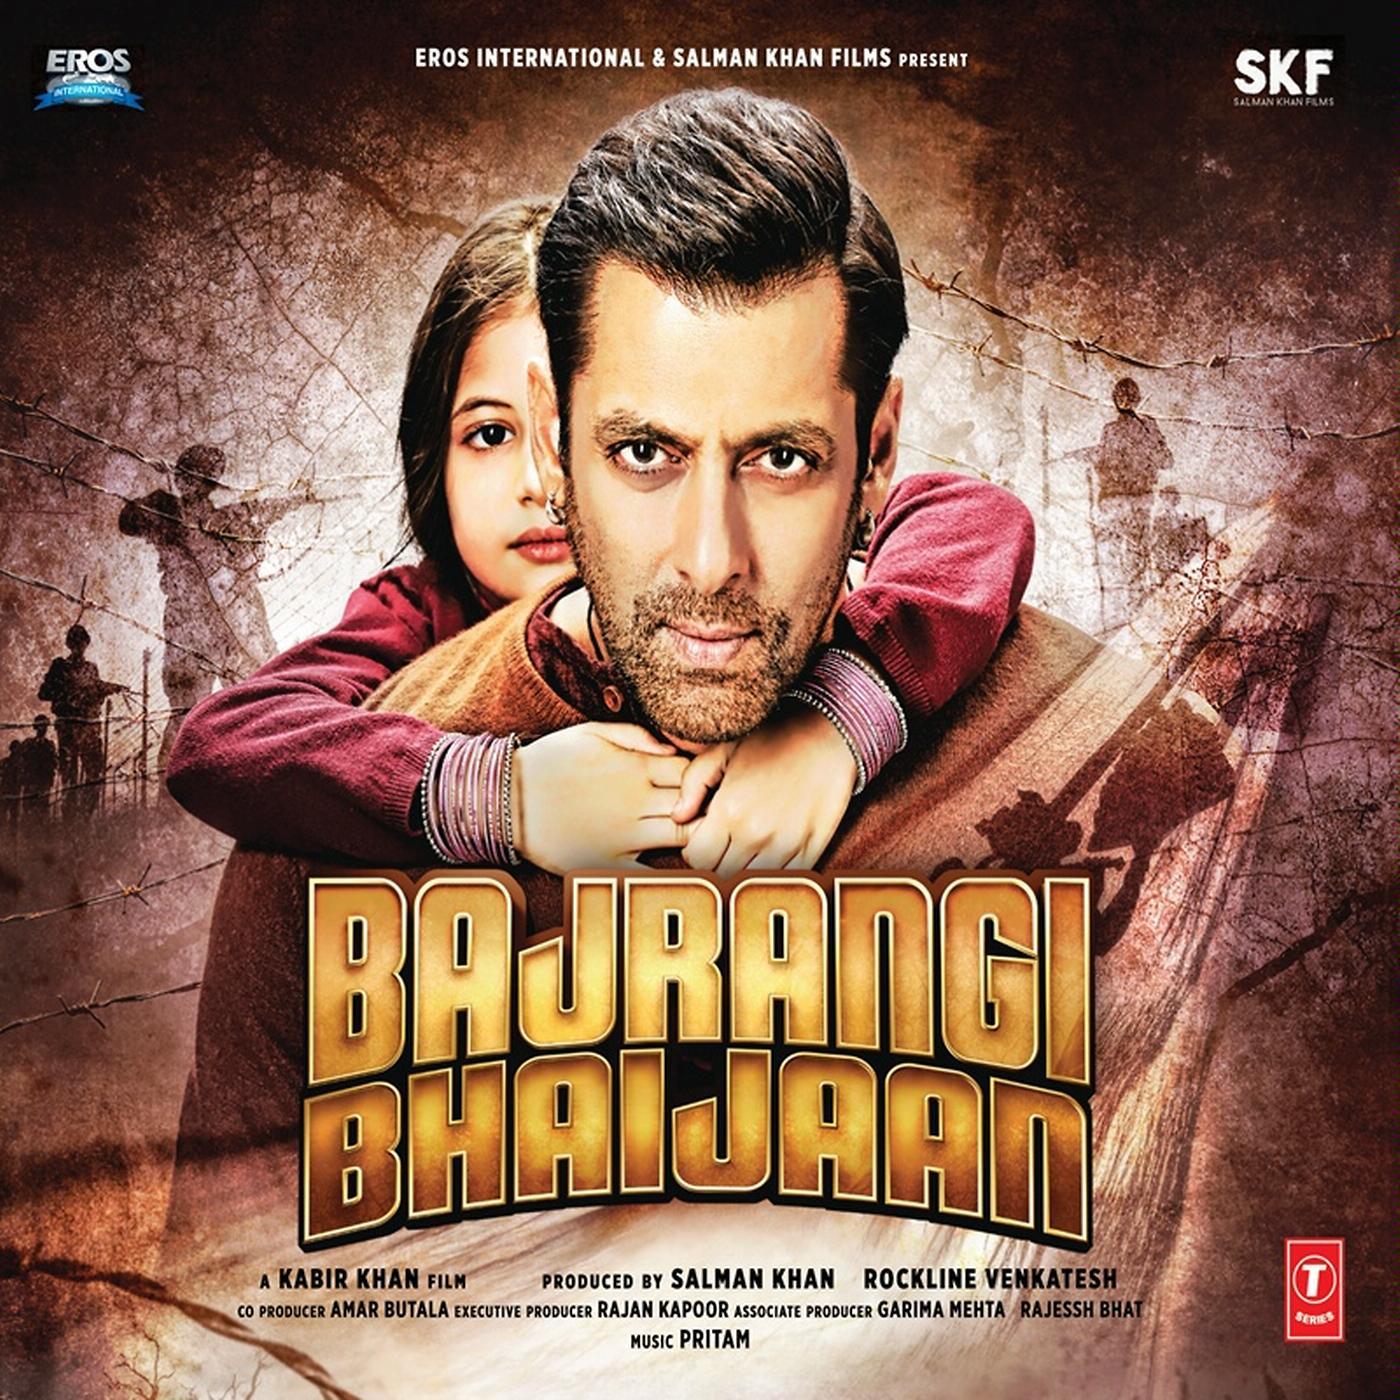 Bajrangi Bhaijaan (Original) - Mika Singh